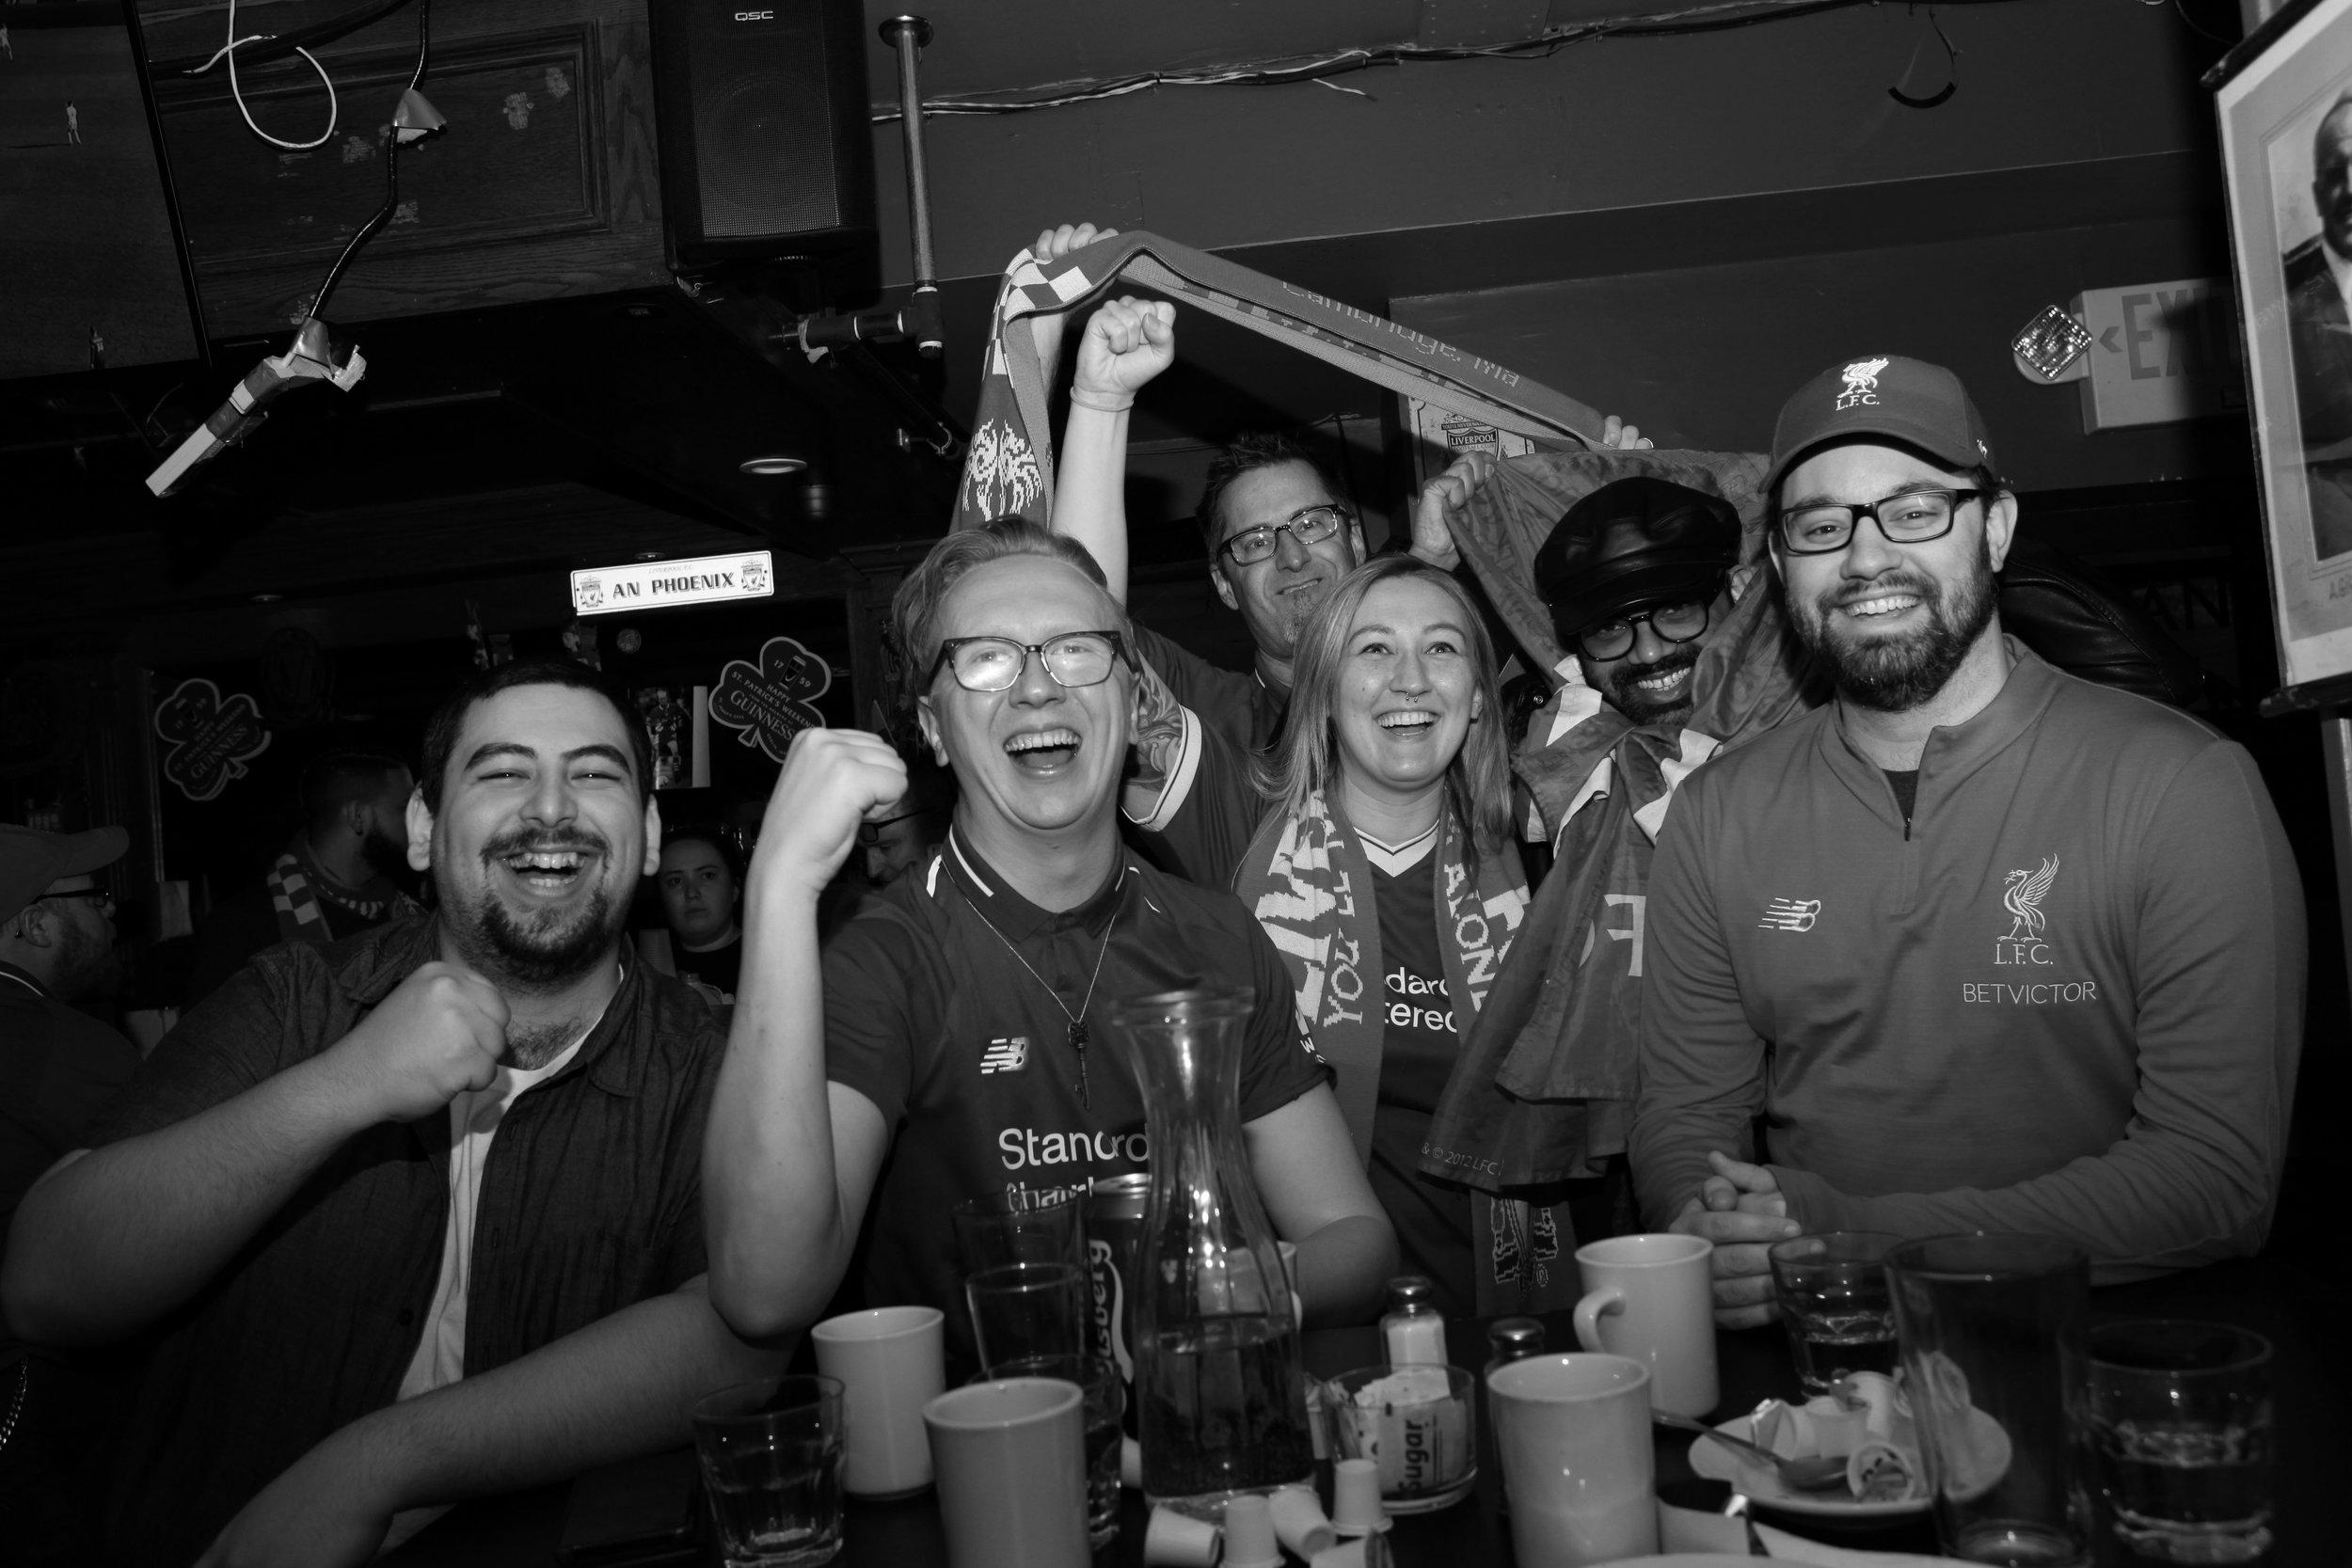 LFC Boston